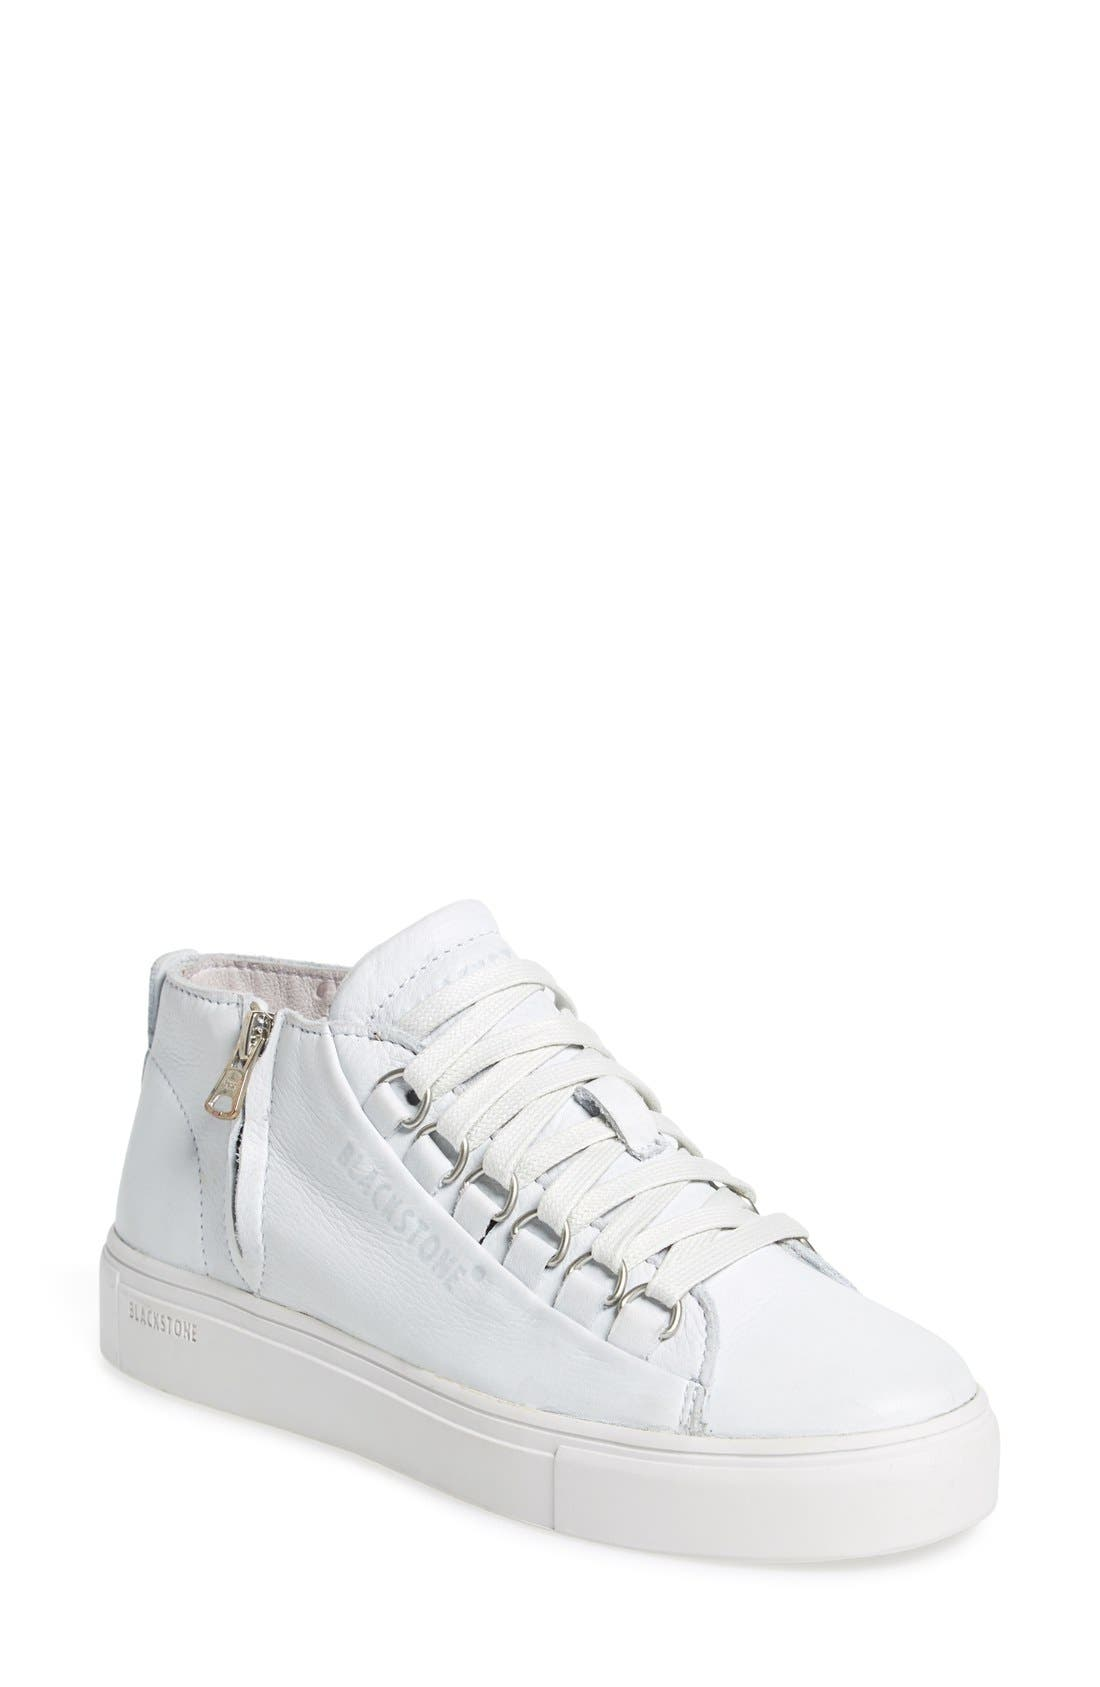 'LL60' Midi Sneaker,                             Main thumbnail 1, color,                             White Leather